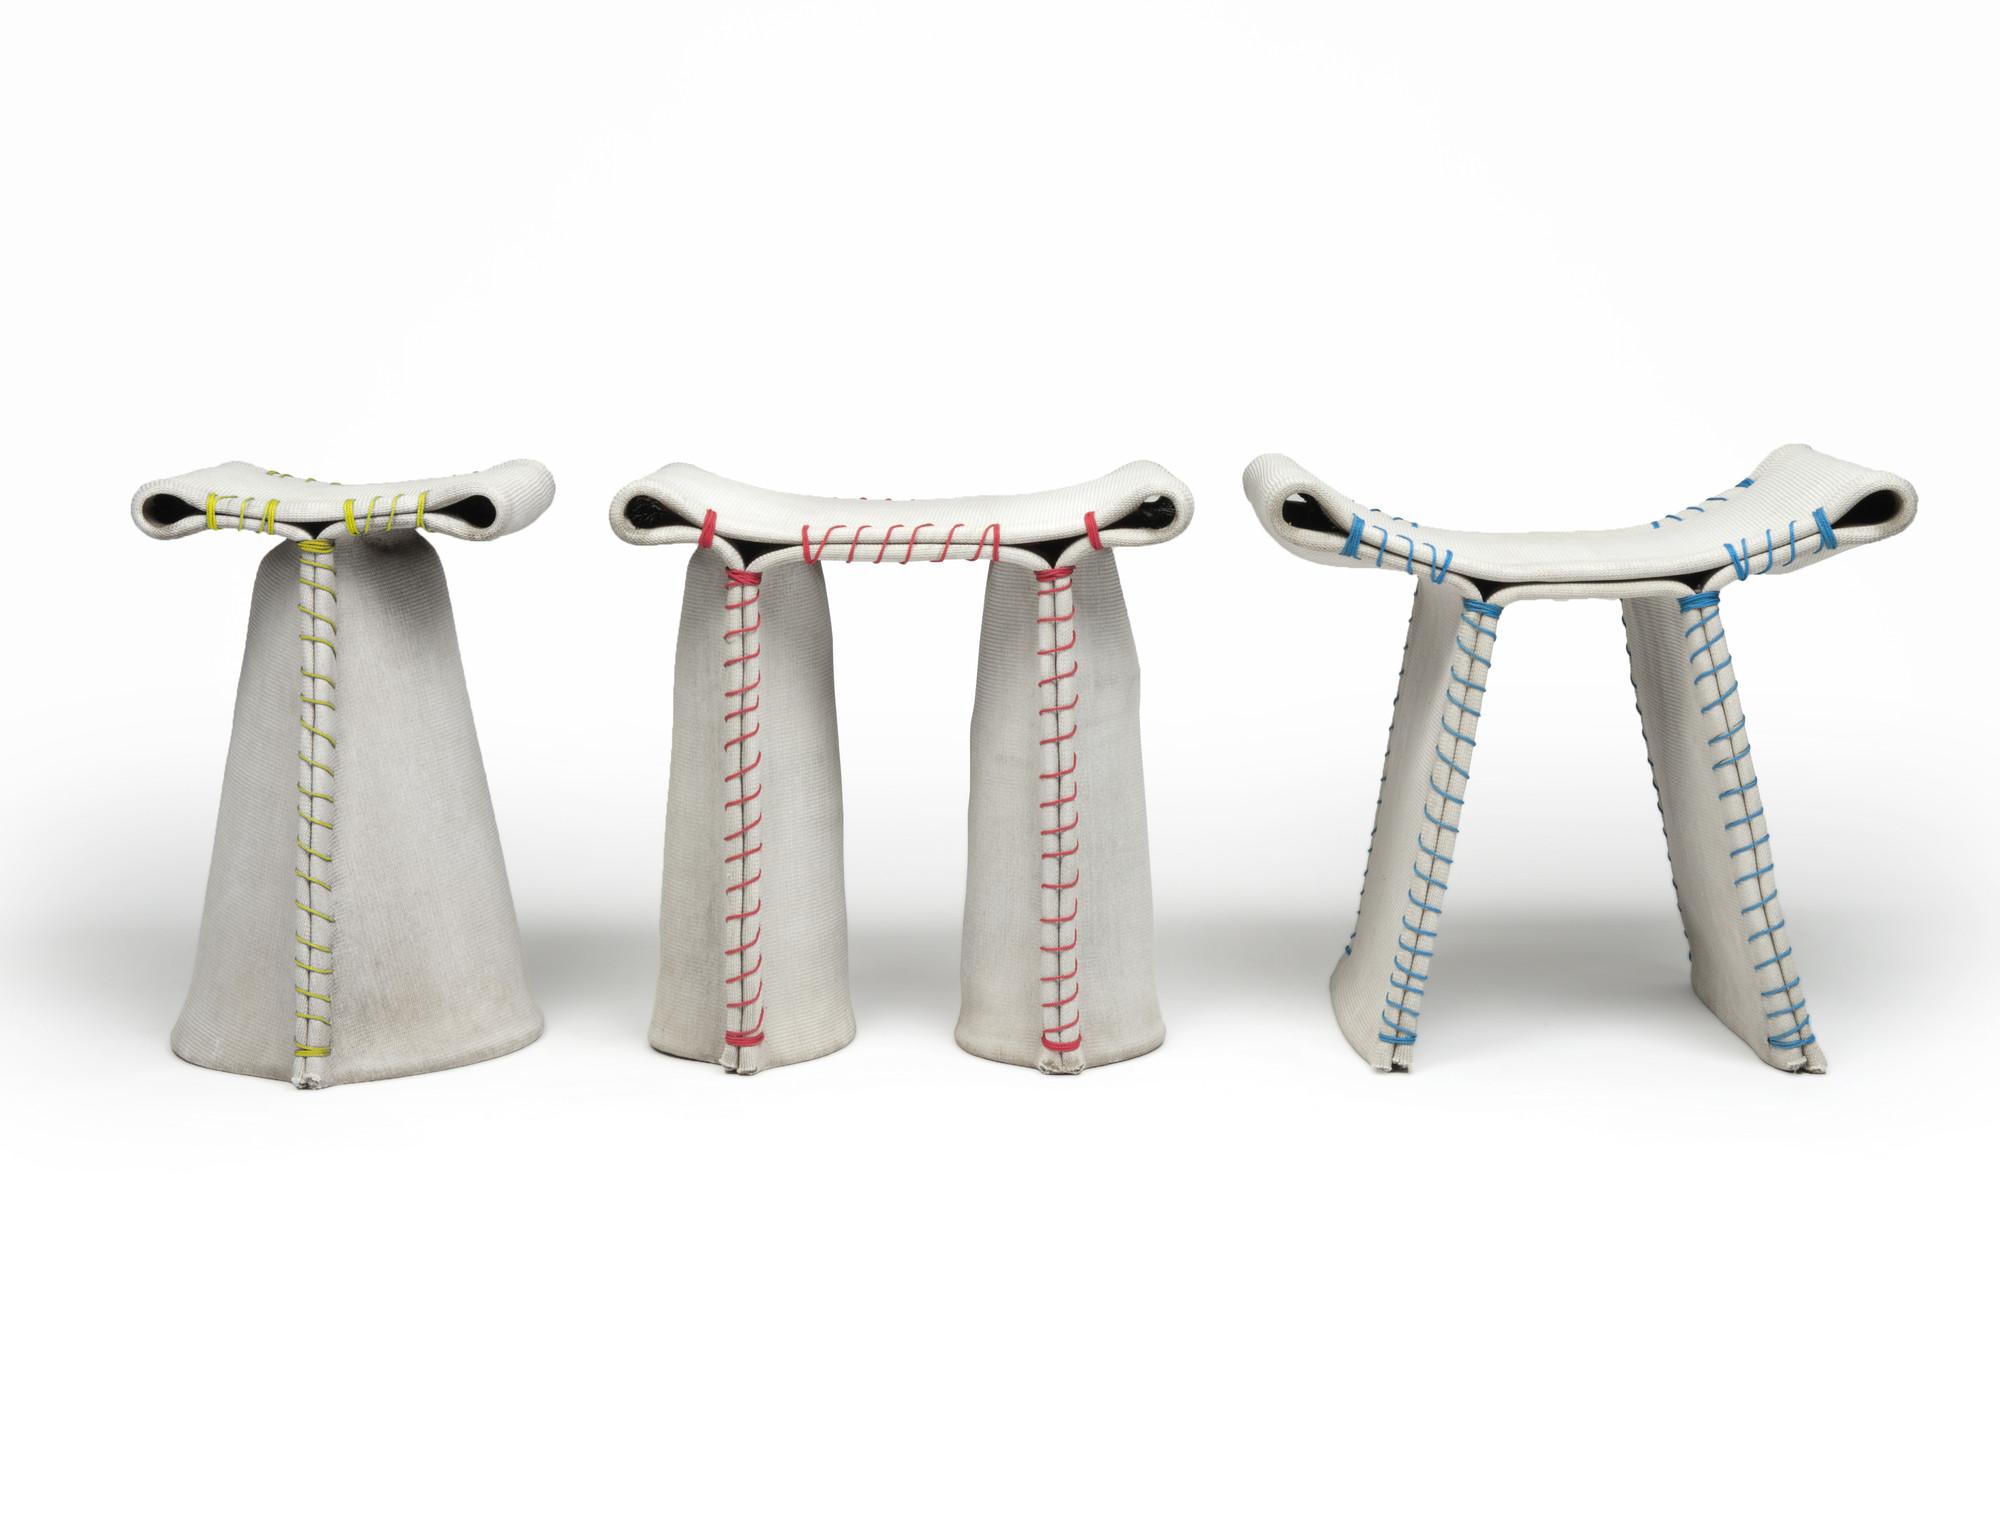 Stitching Concrete / Florian Schmid, Cortesia de Florian Schmid